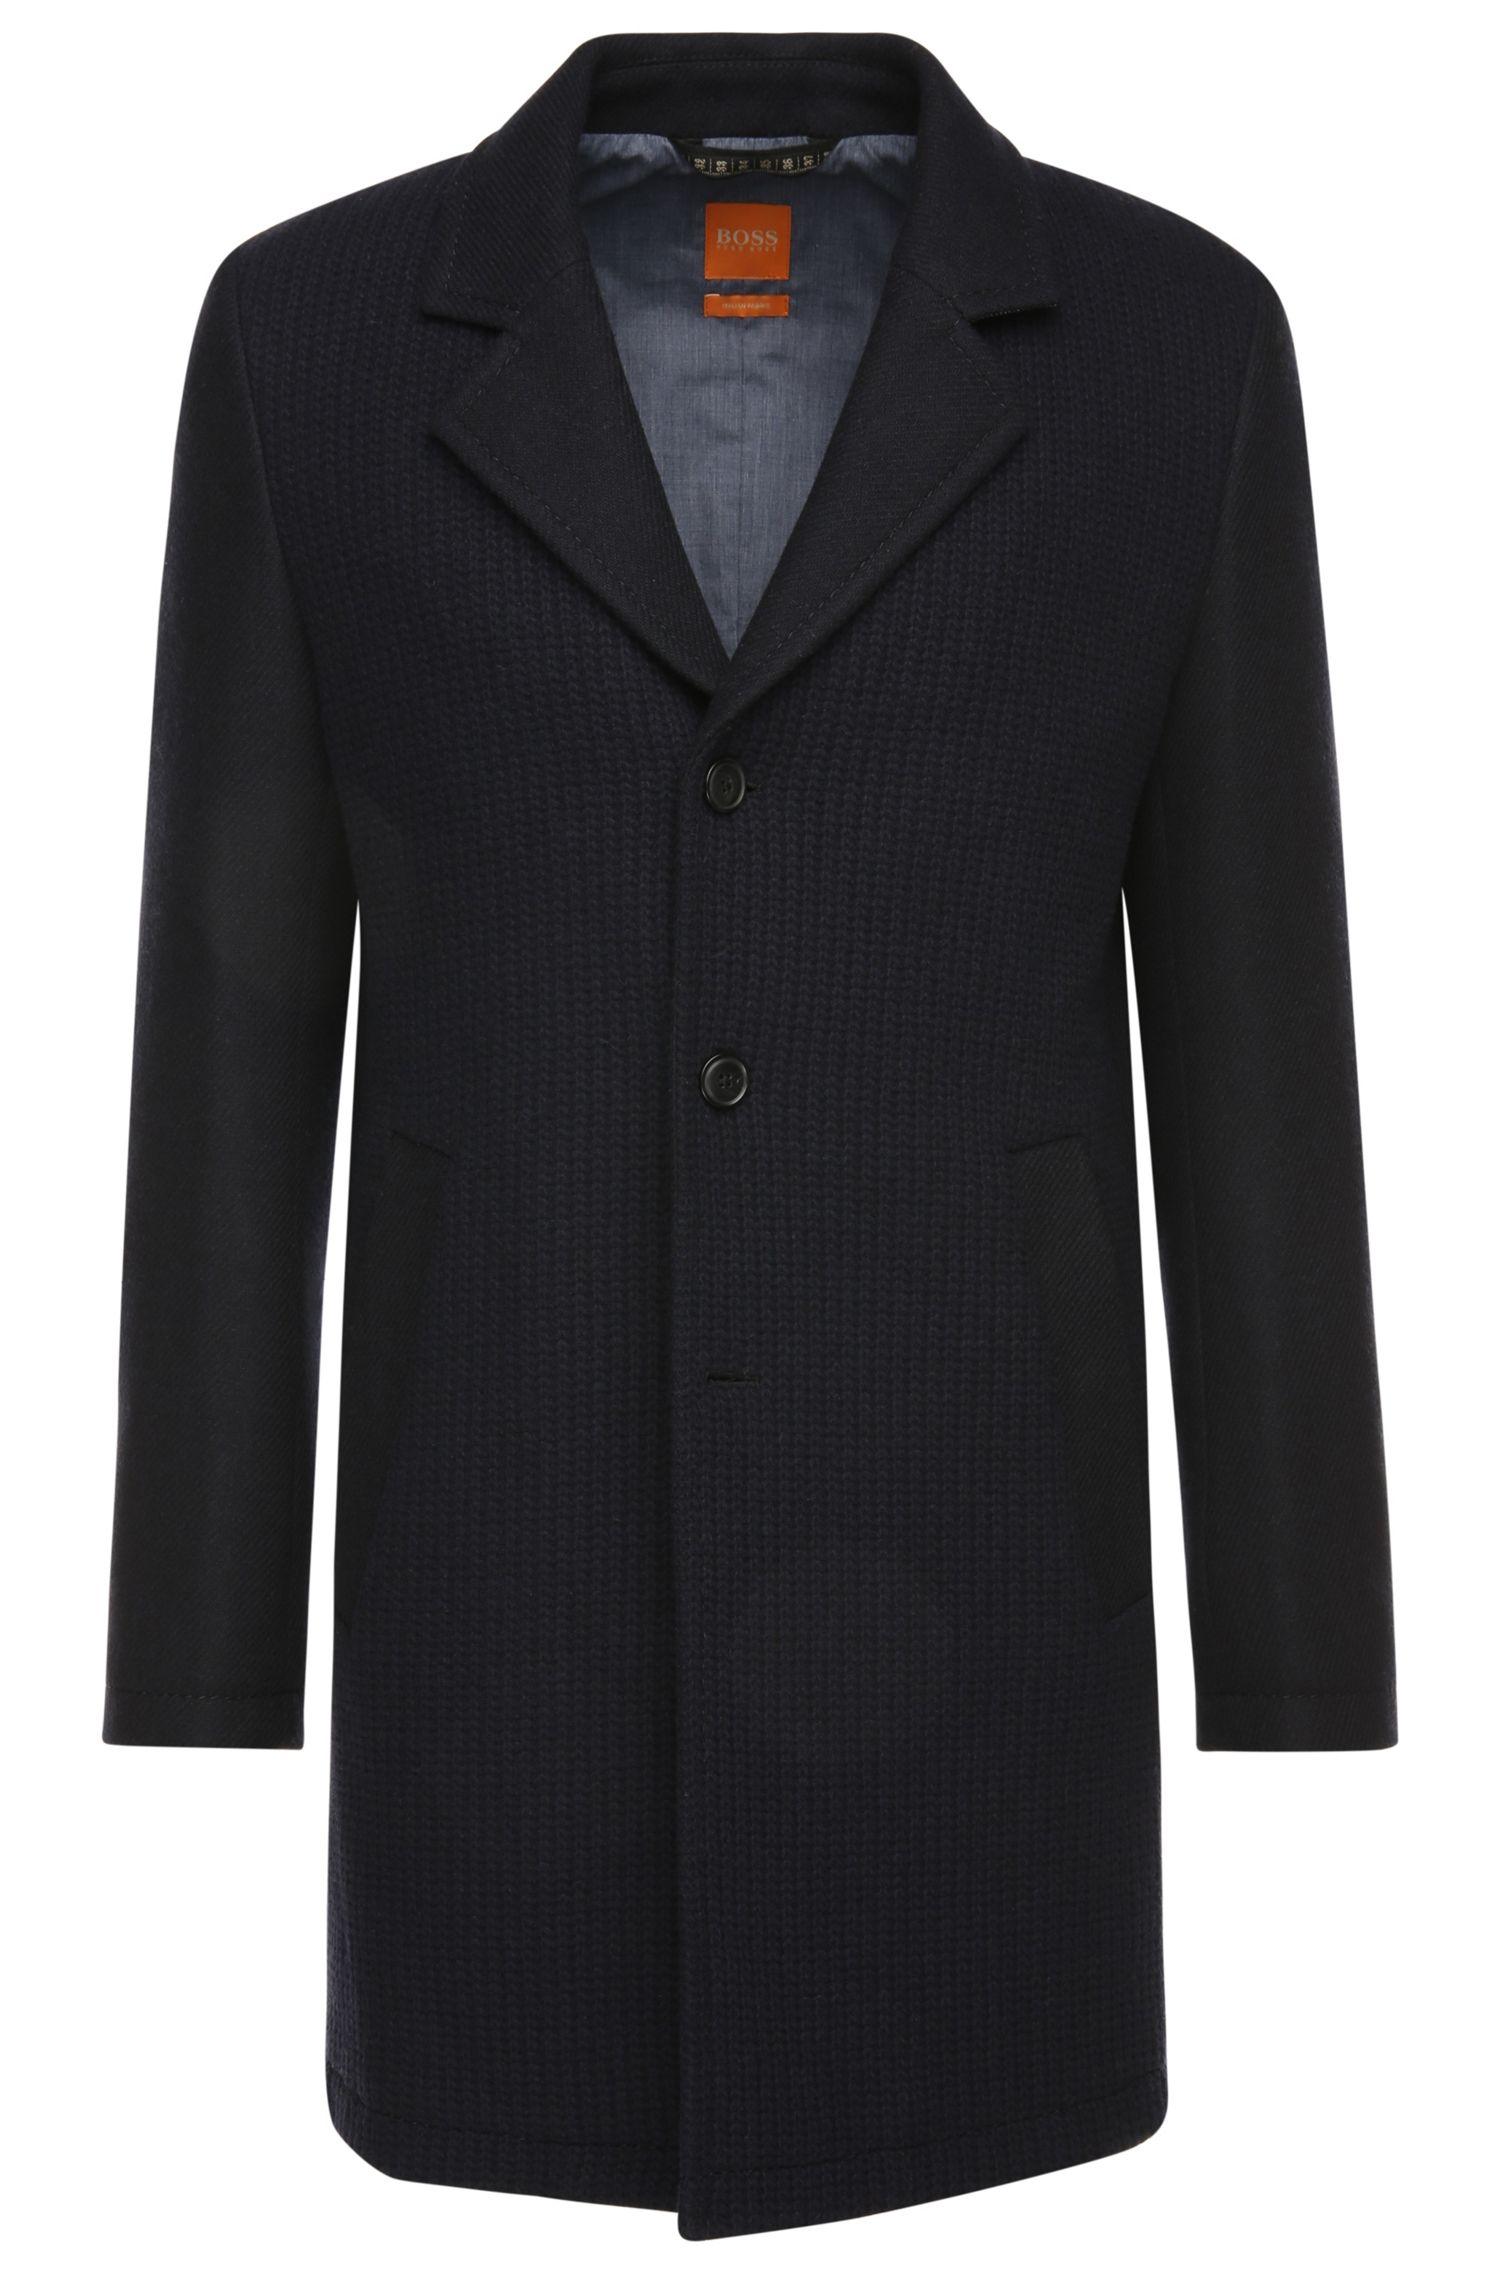 'Balley'   Wool Blend Knit Body Car Coat